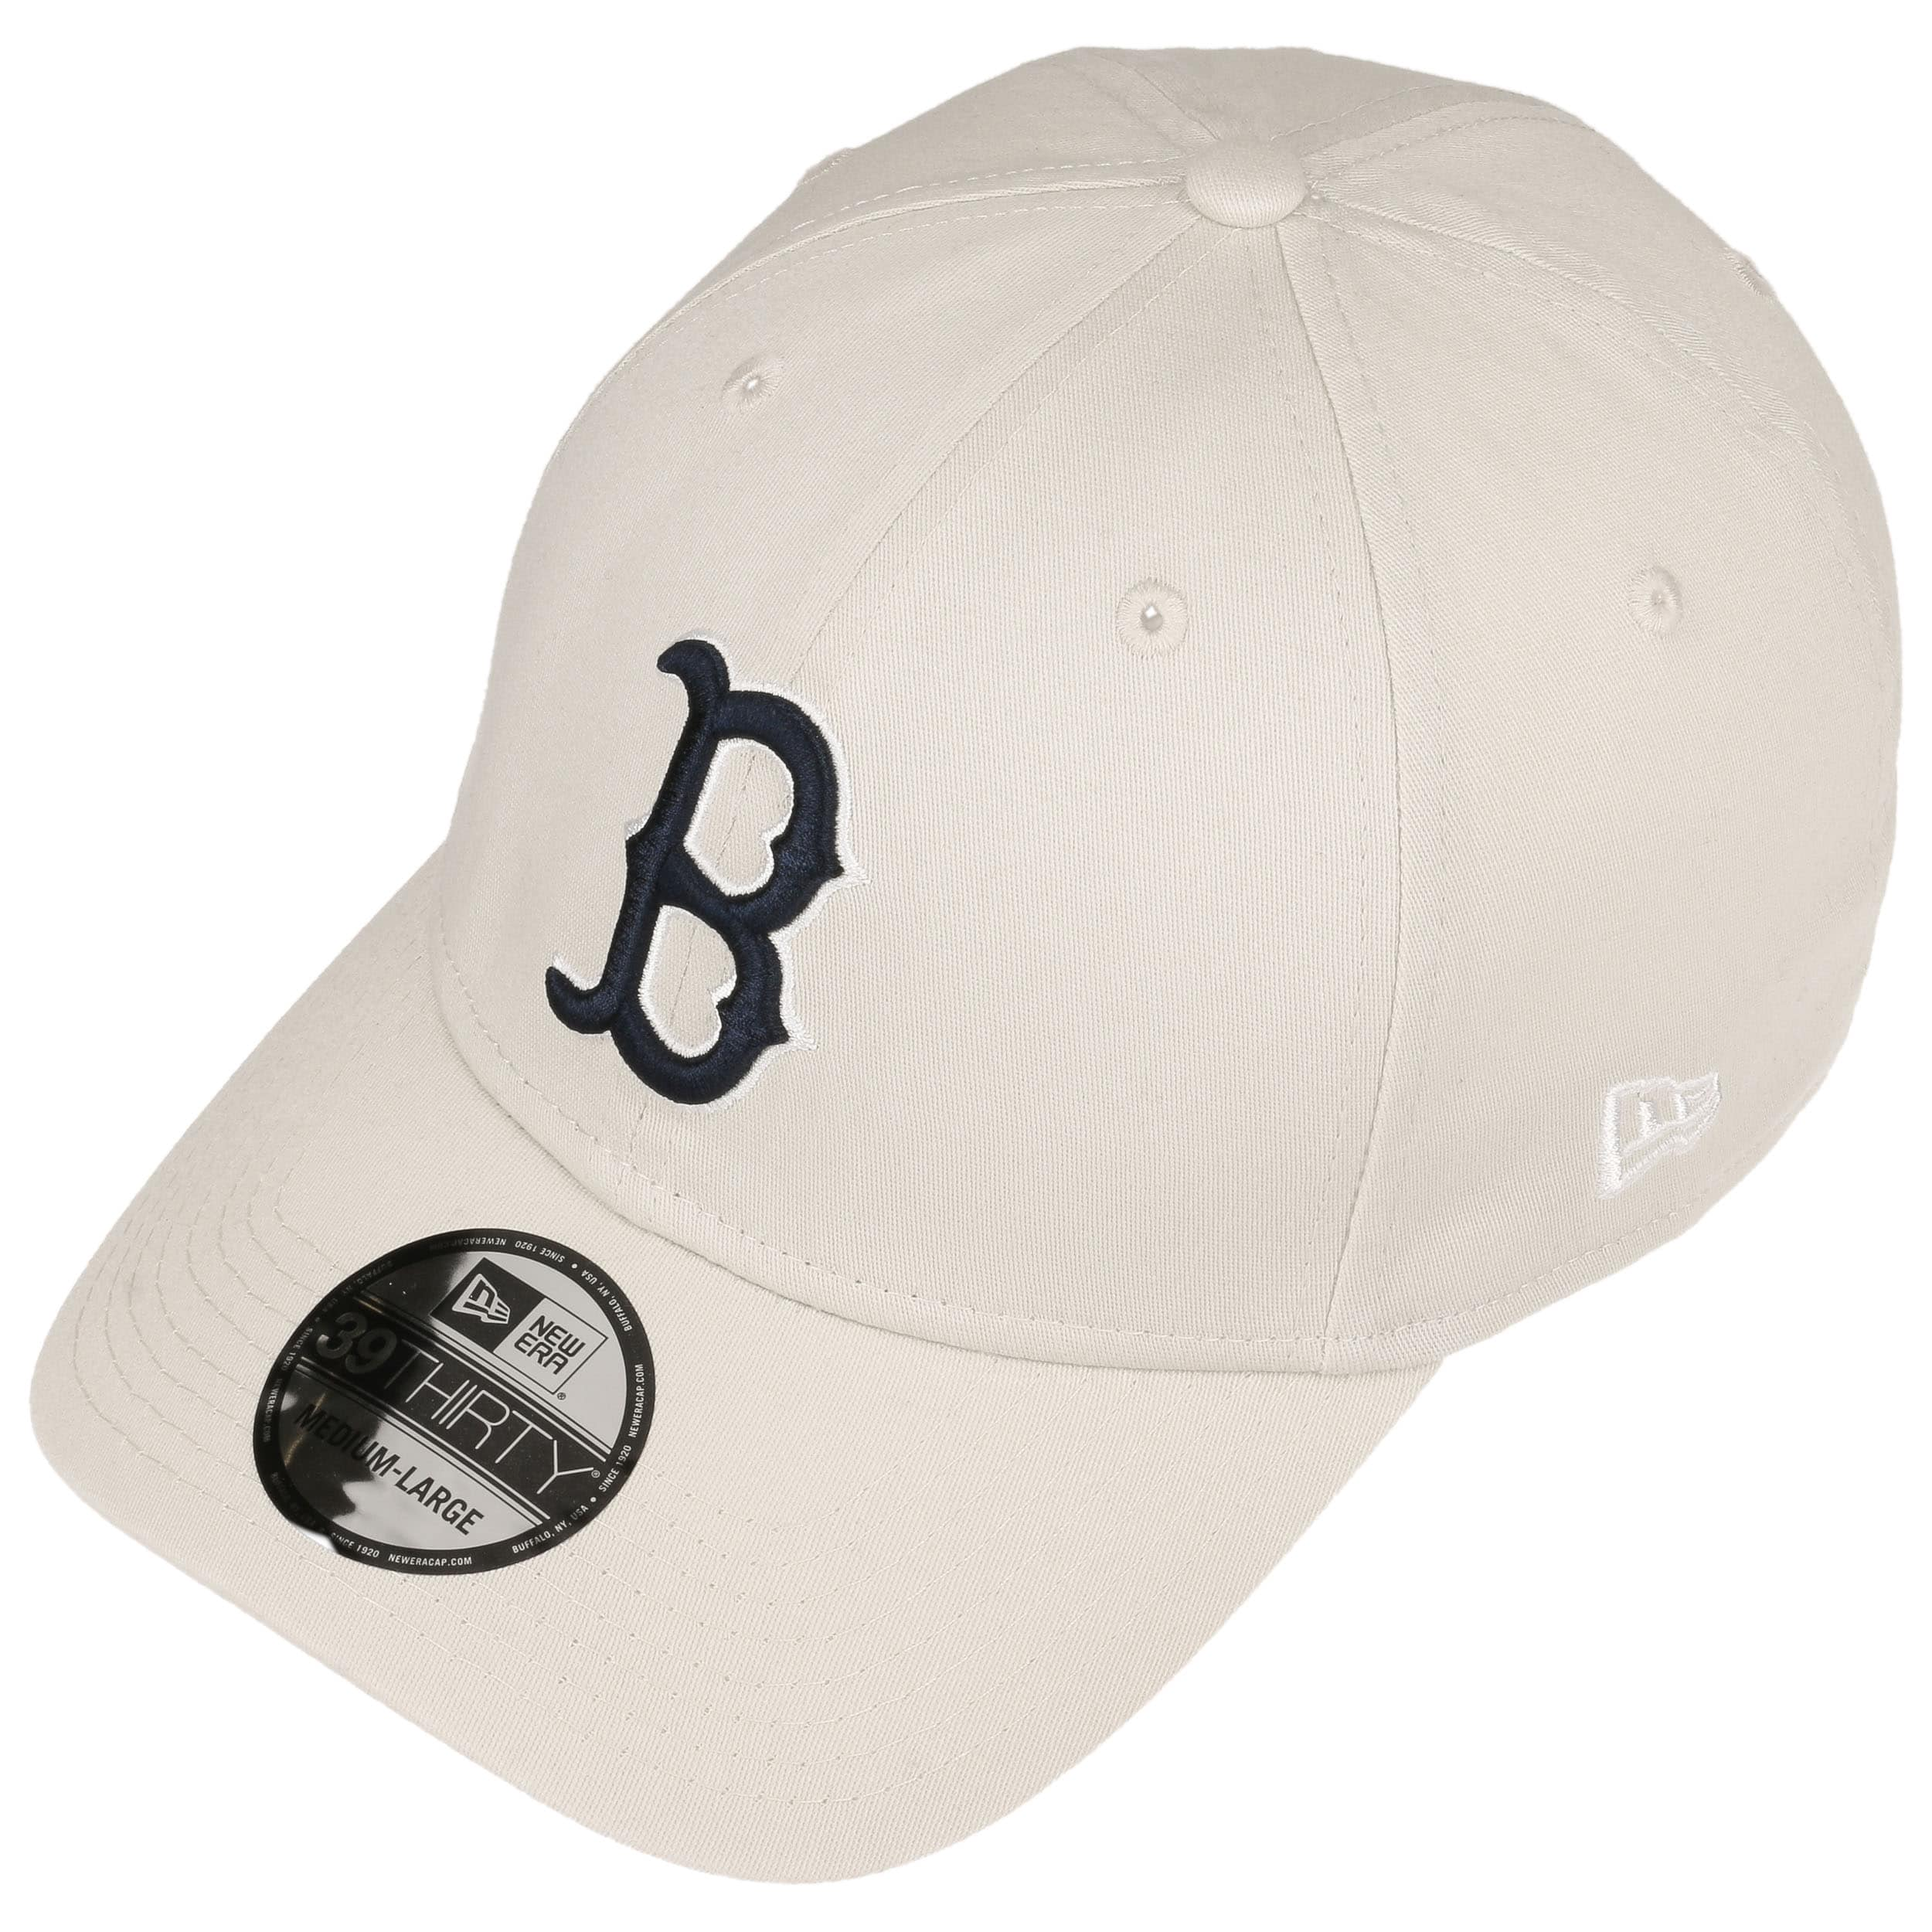 2e222f2c916c6 Gorra 39Thirty Red Sox by New Era - Gorras - sombreroshop.es